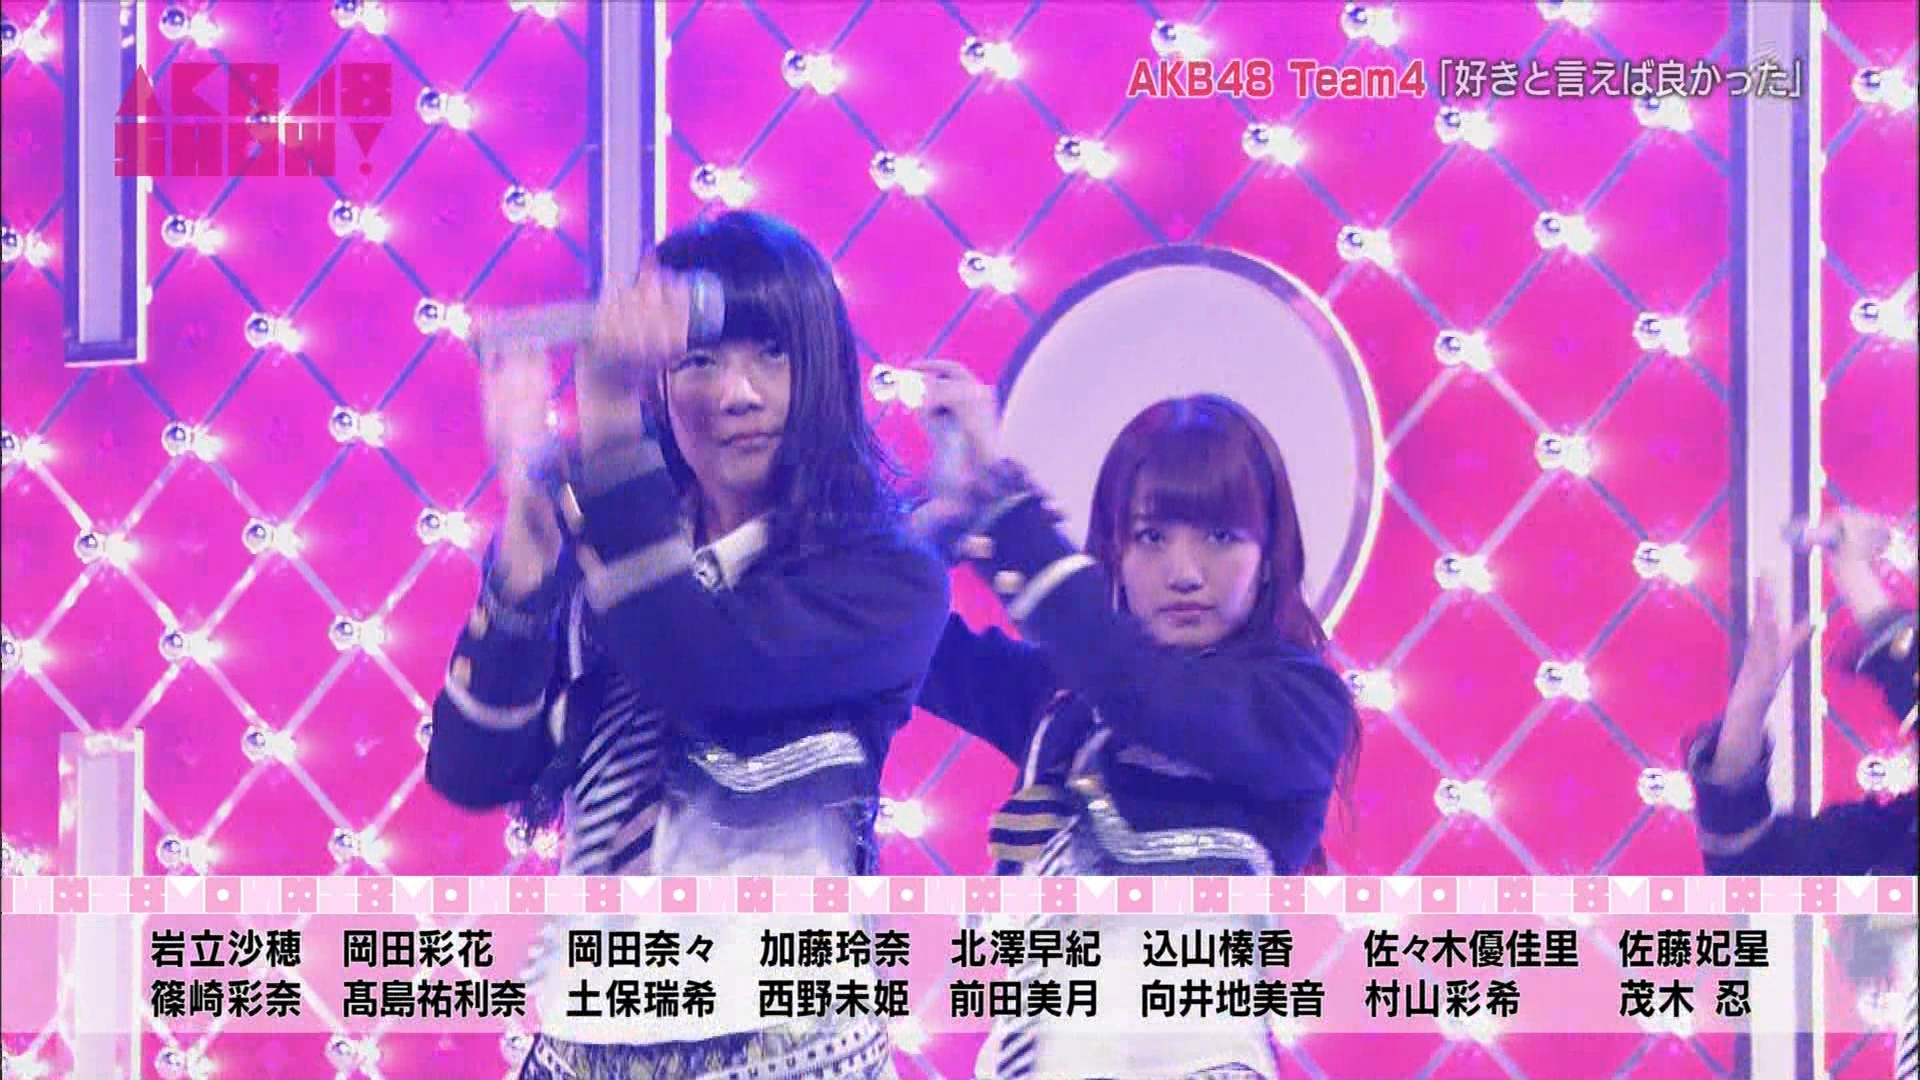 AKB48SHOW チーム4好きといえば良かった 加藤玲奈 20140830 (4)